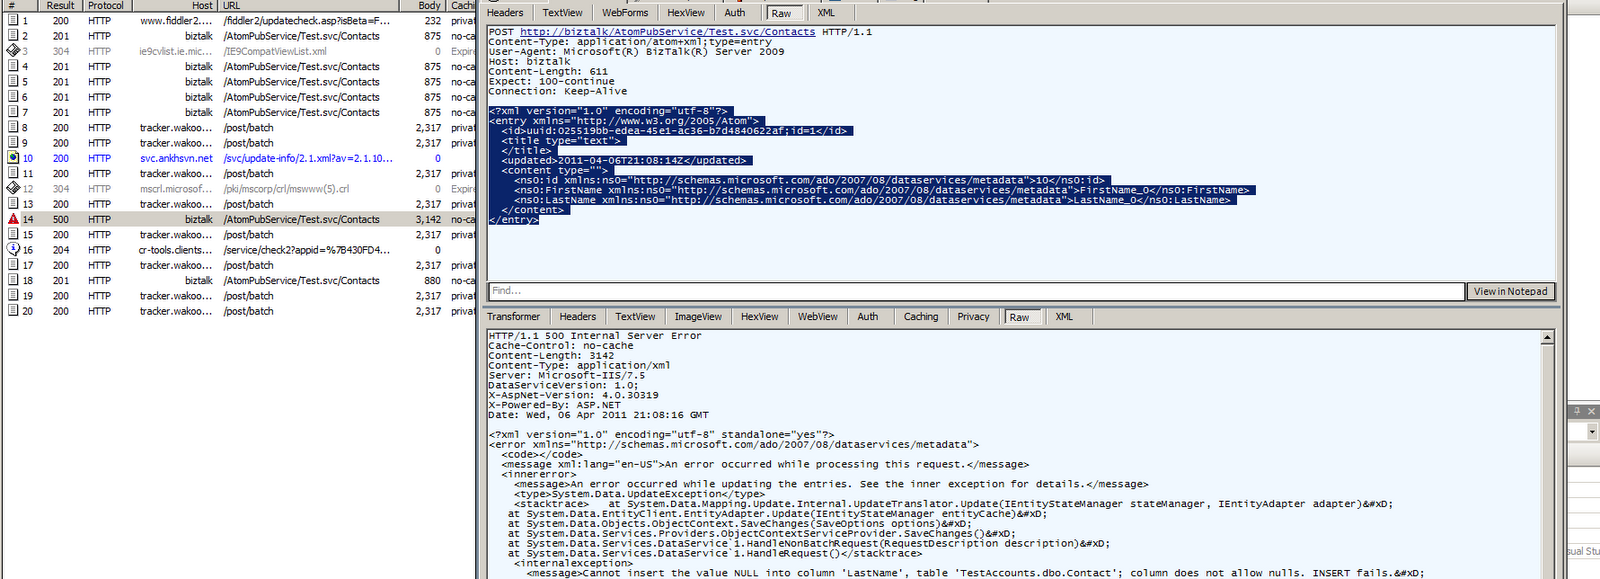 BizTalk to WCF Data Services Part 2 (WCF Custom Adapter